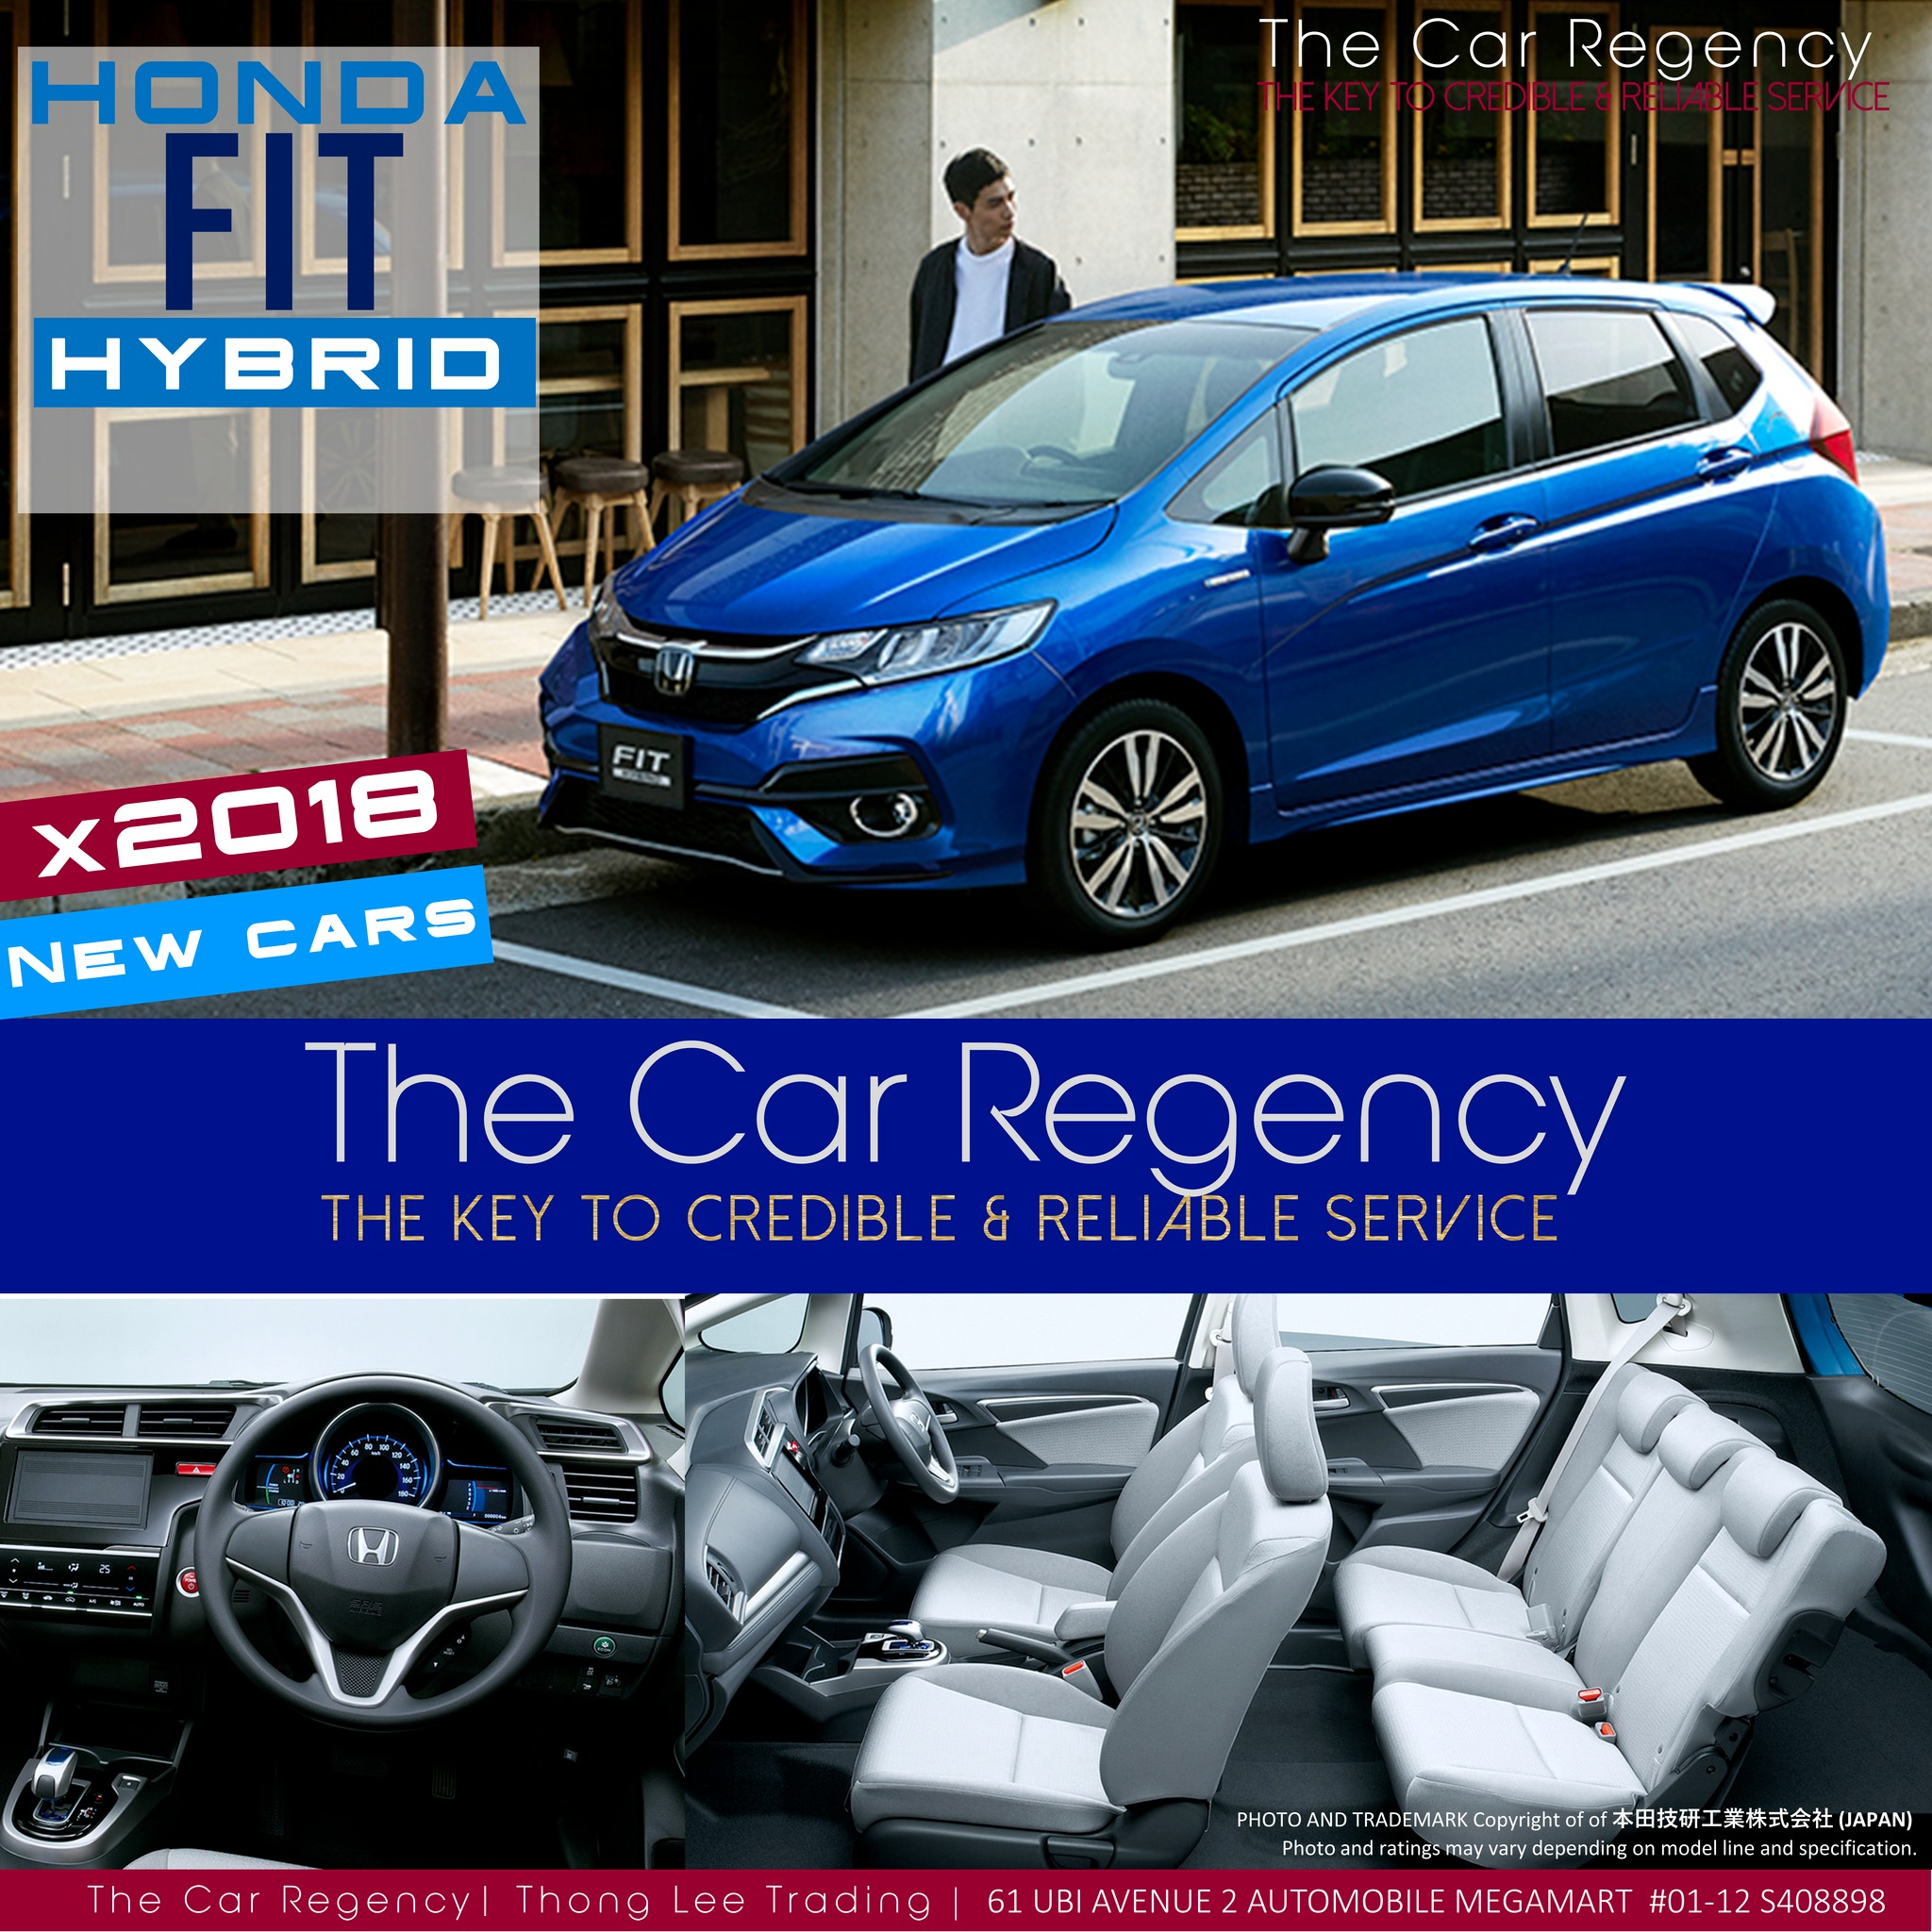 Honda Honda Fit Jazz Hybrid New 2018 Mini 5 Seater